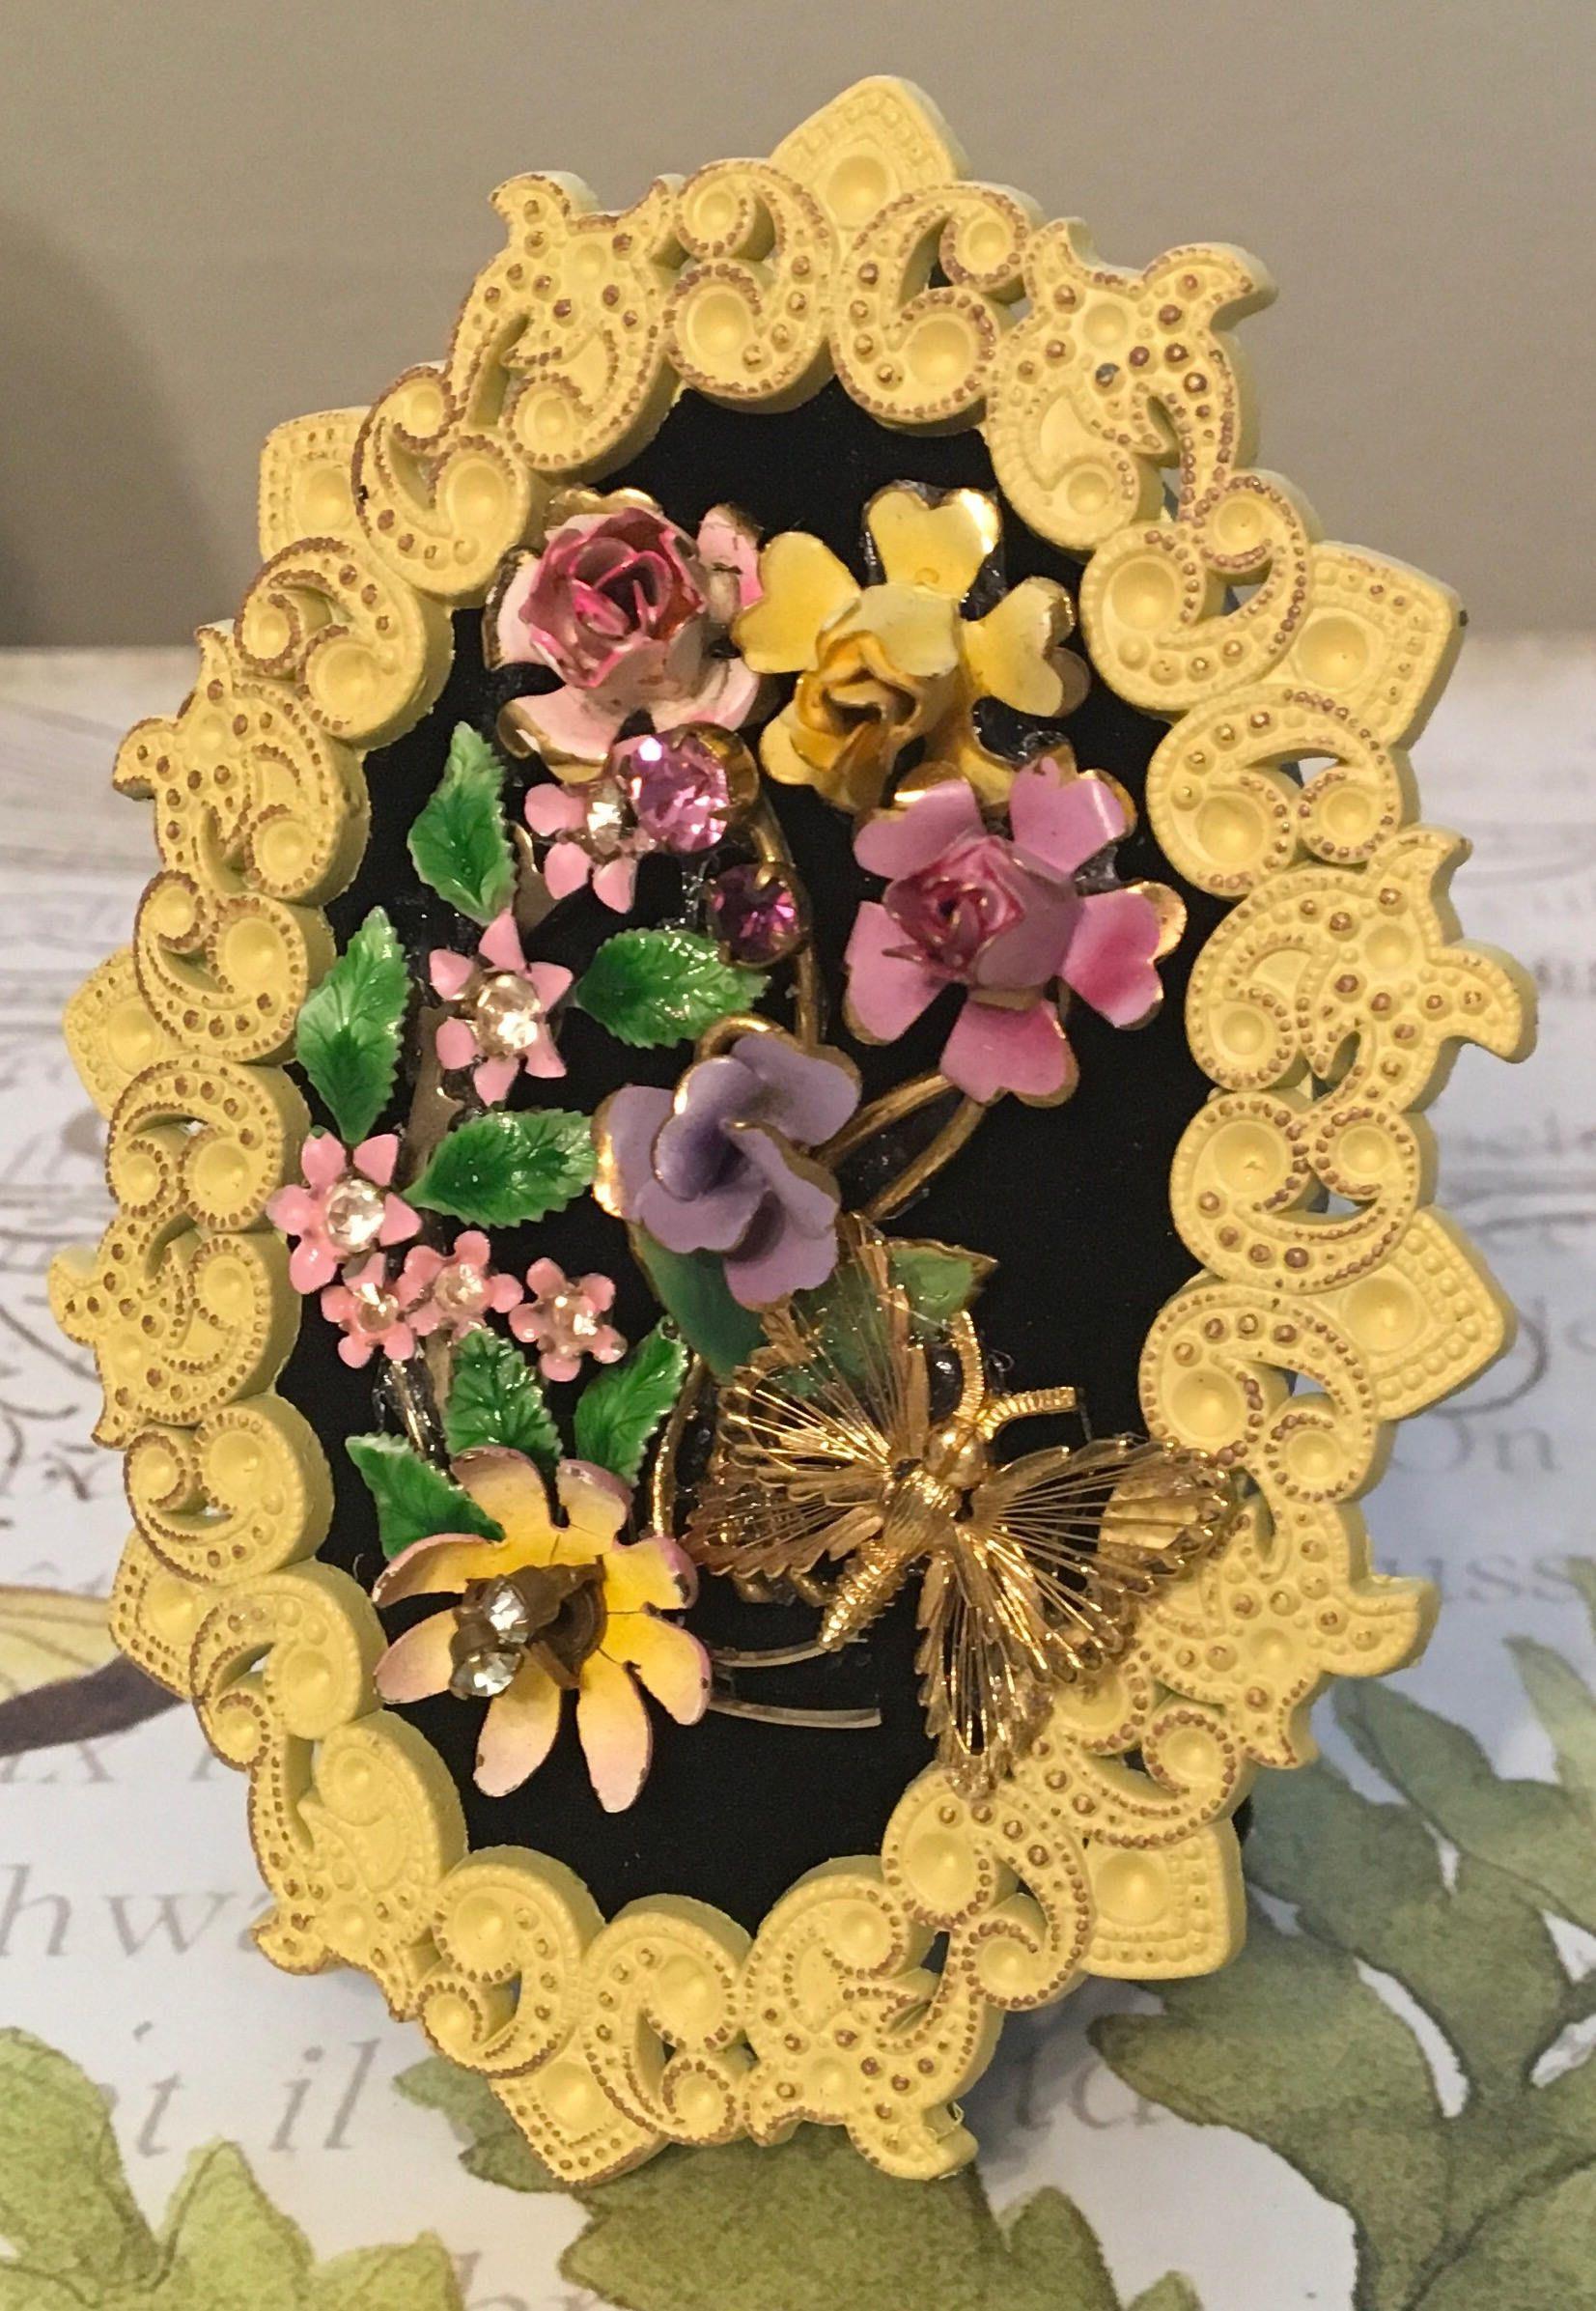 Mini Vintage Jewelry Flower Bouquet Art Collage Picture Future